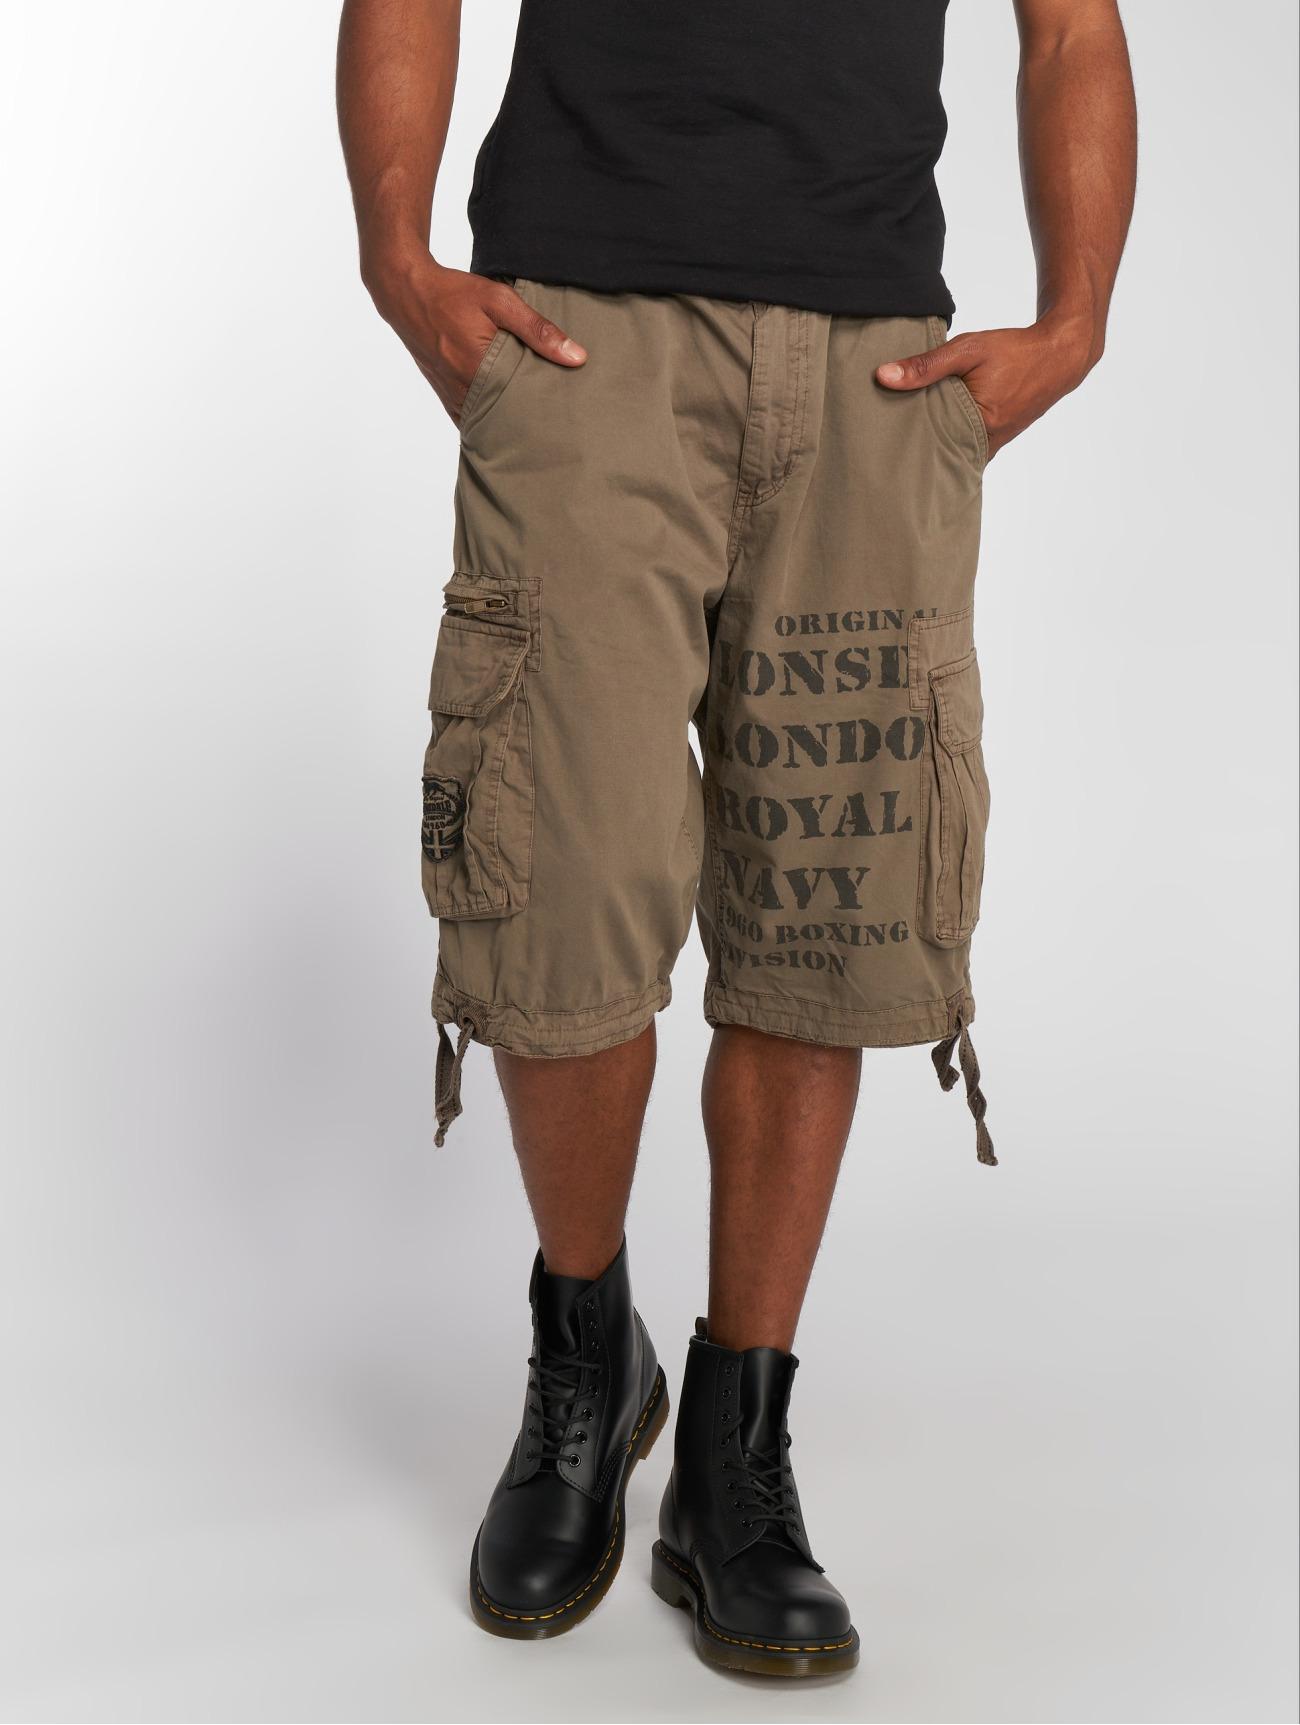 Lonsdale London  London Plain  kaki Homme Short  544844 Homme Pantalons & Shorts